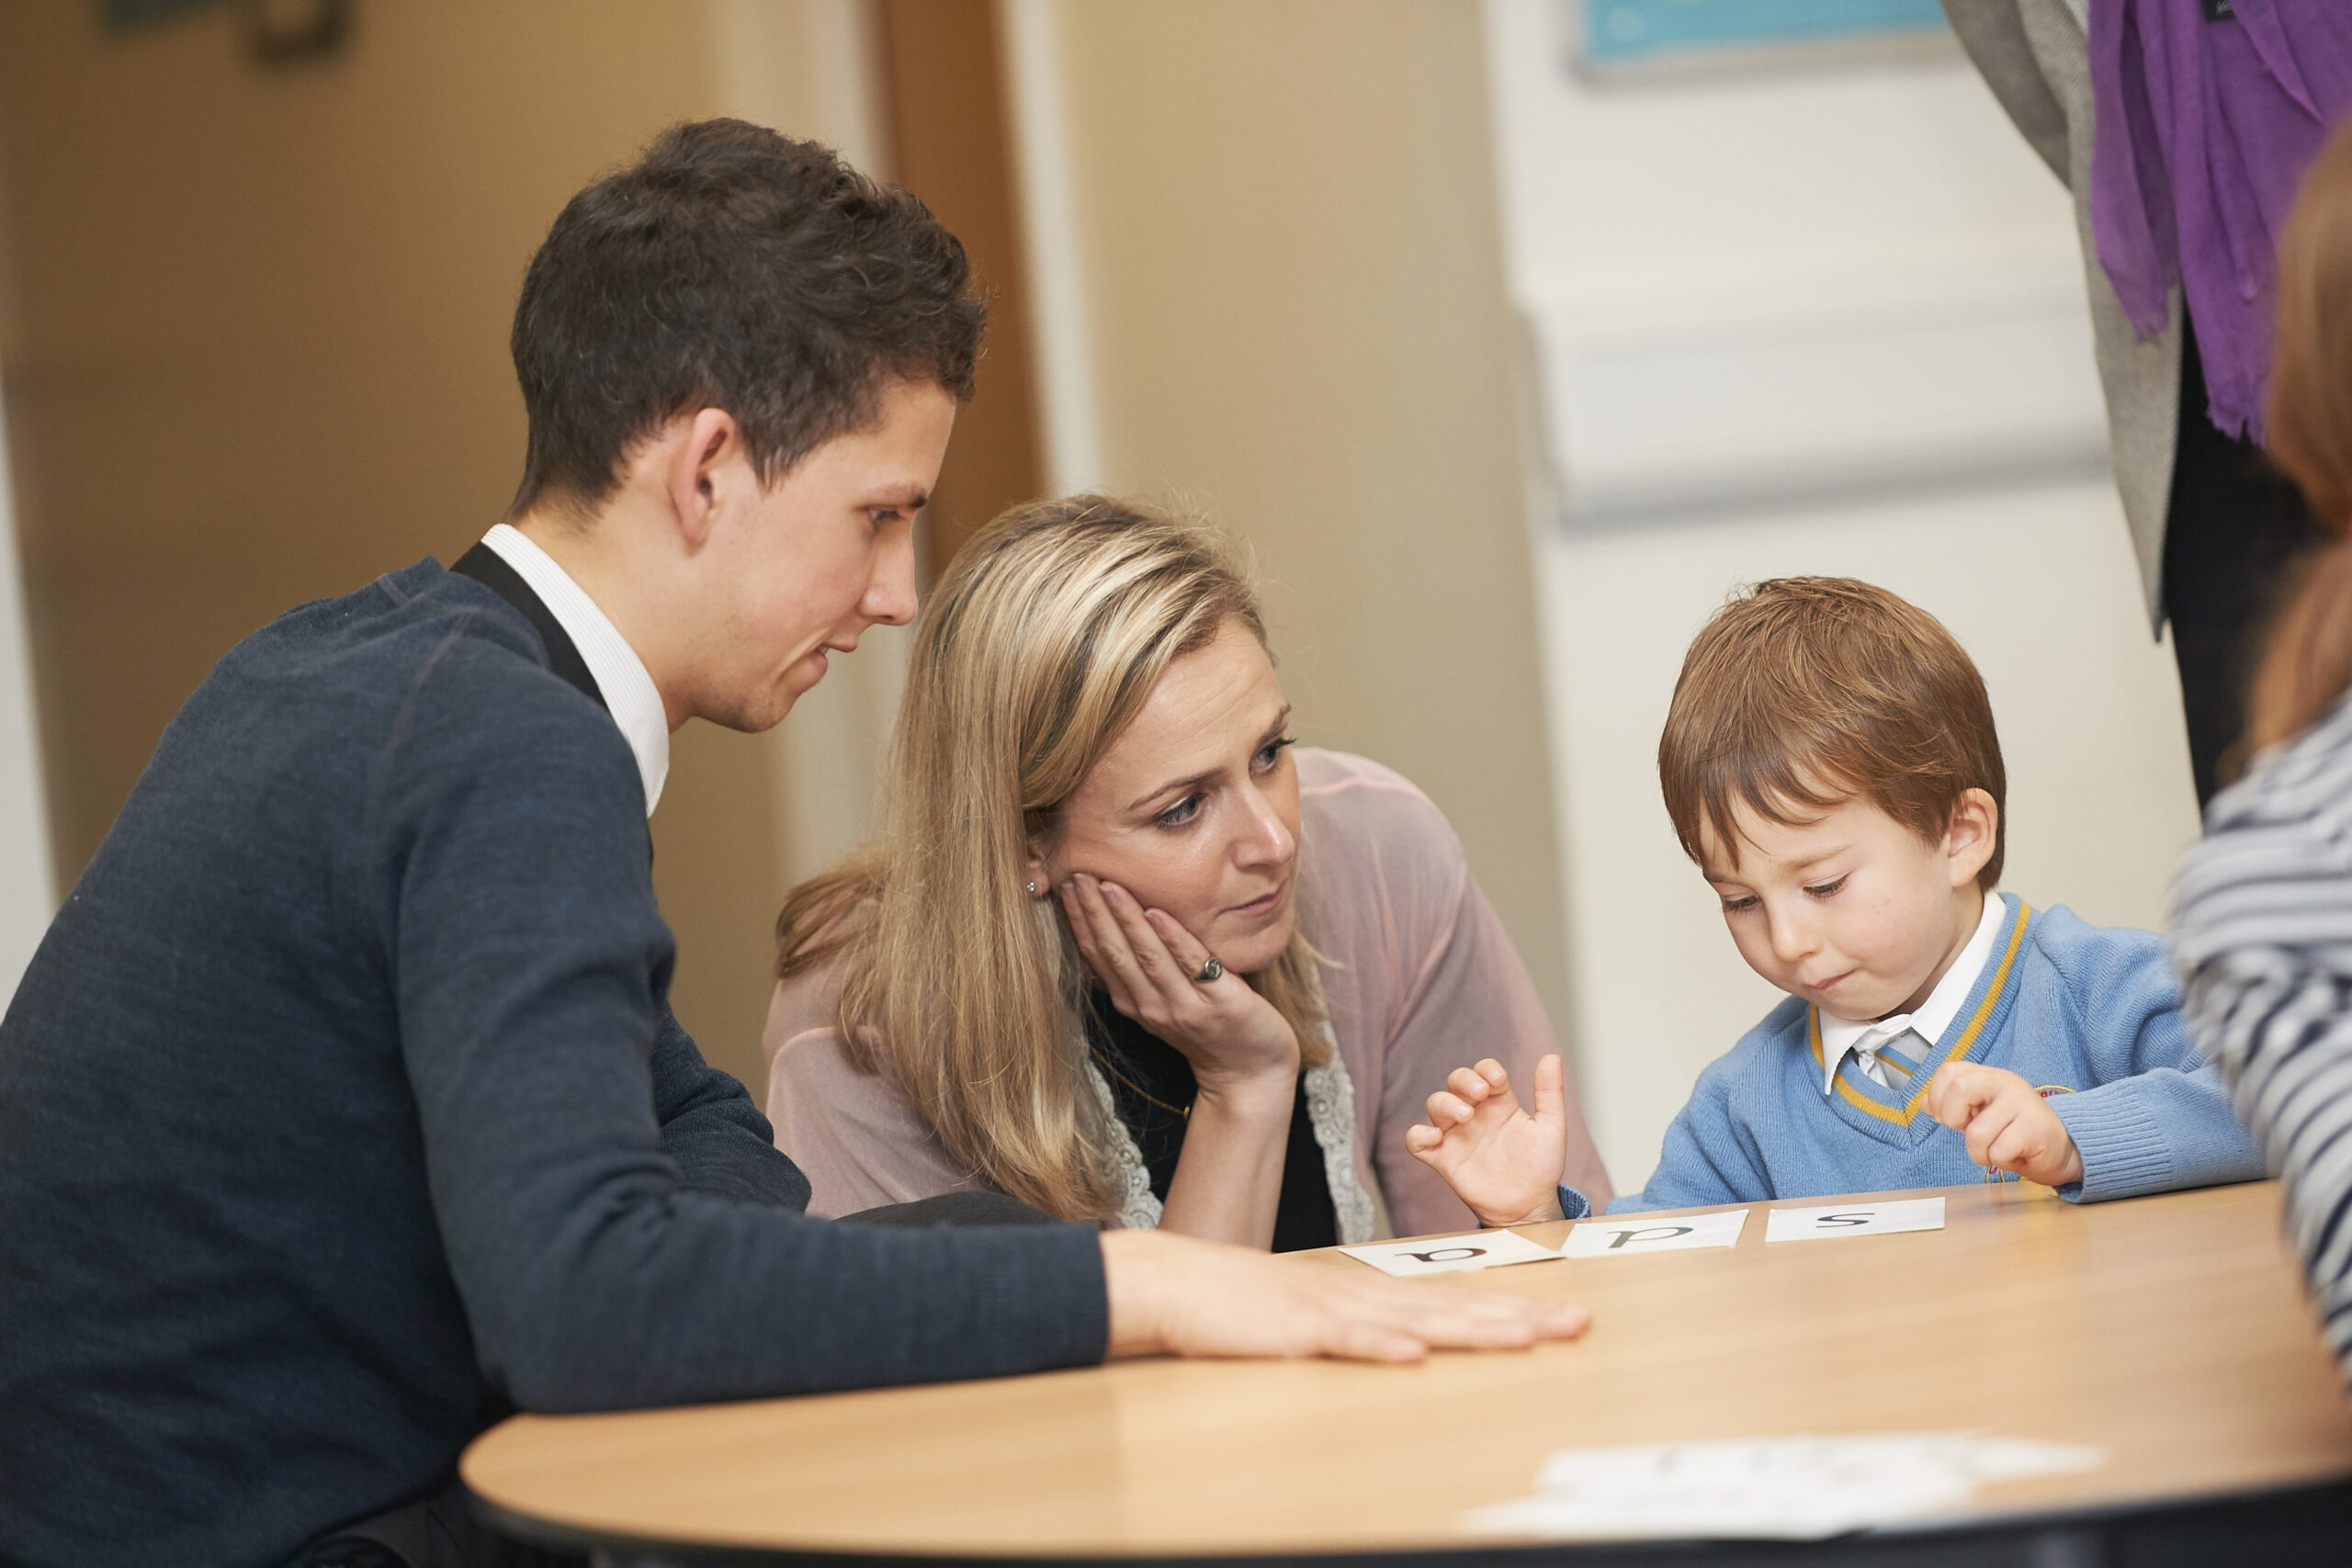 Graduate co-teacher programme with Ark Teacher Training